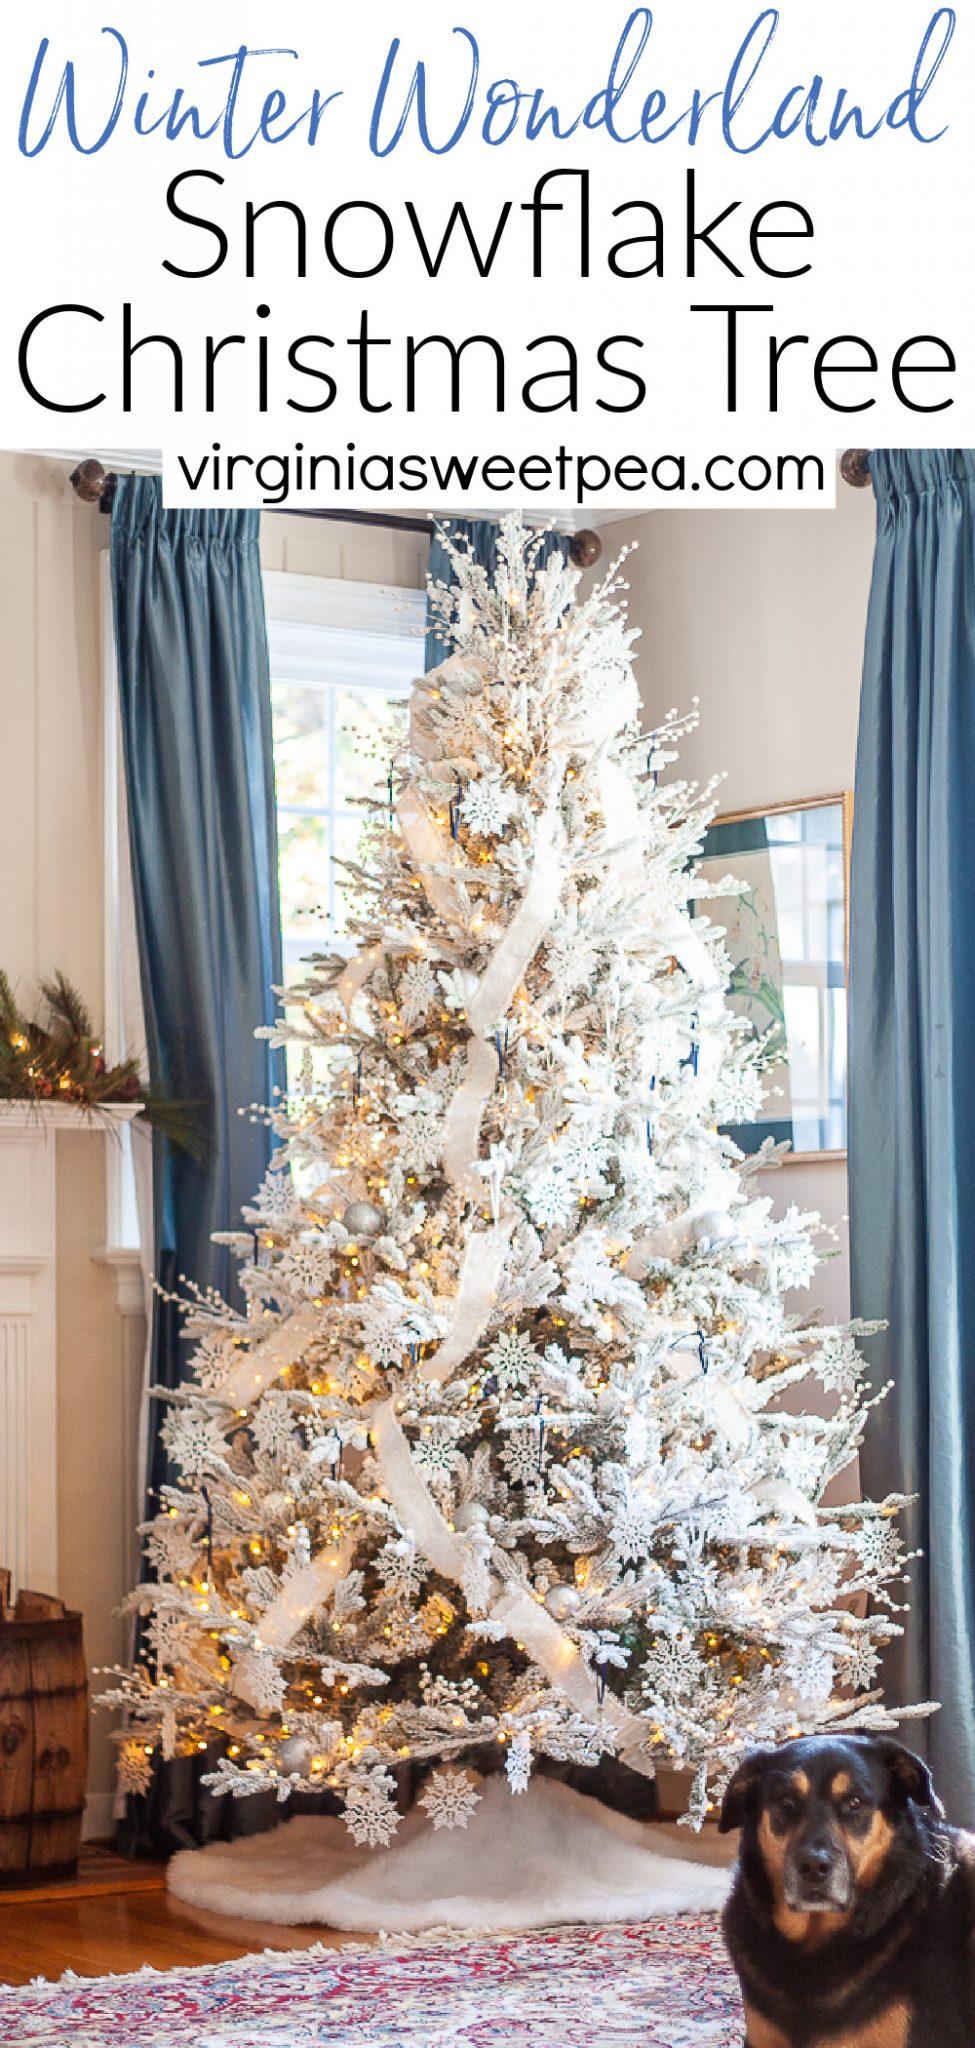 Winter Wonderland Snowflake Christmas Tree